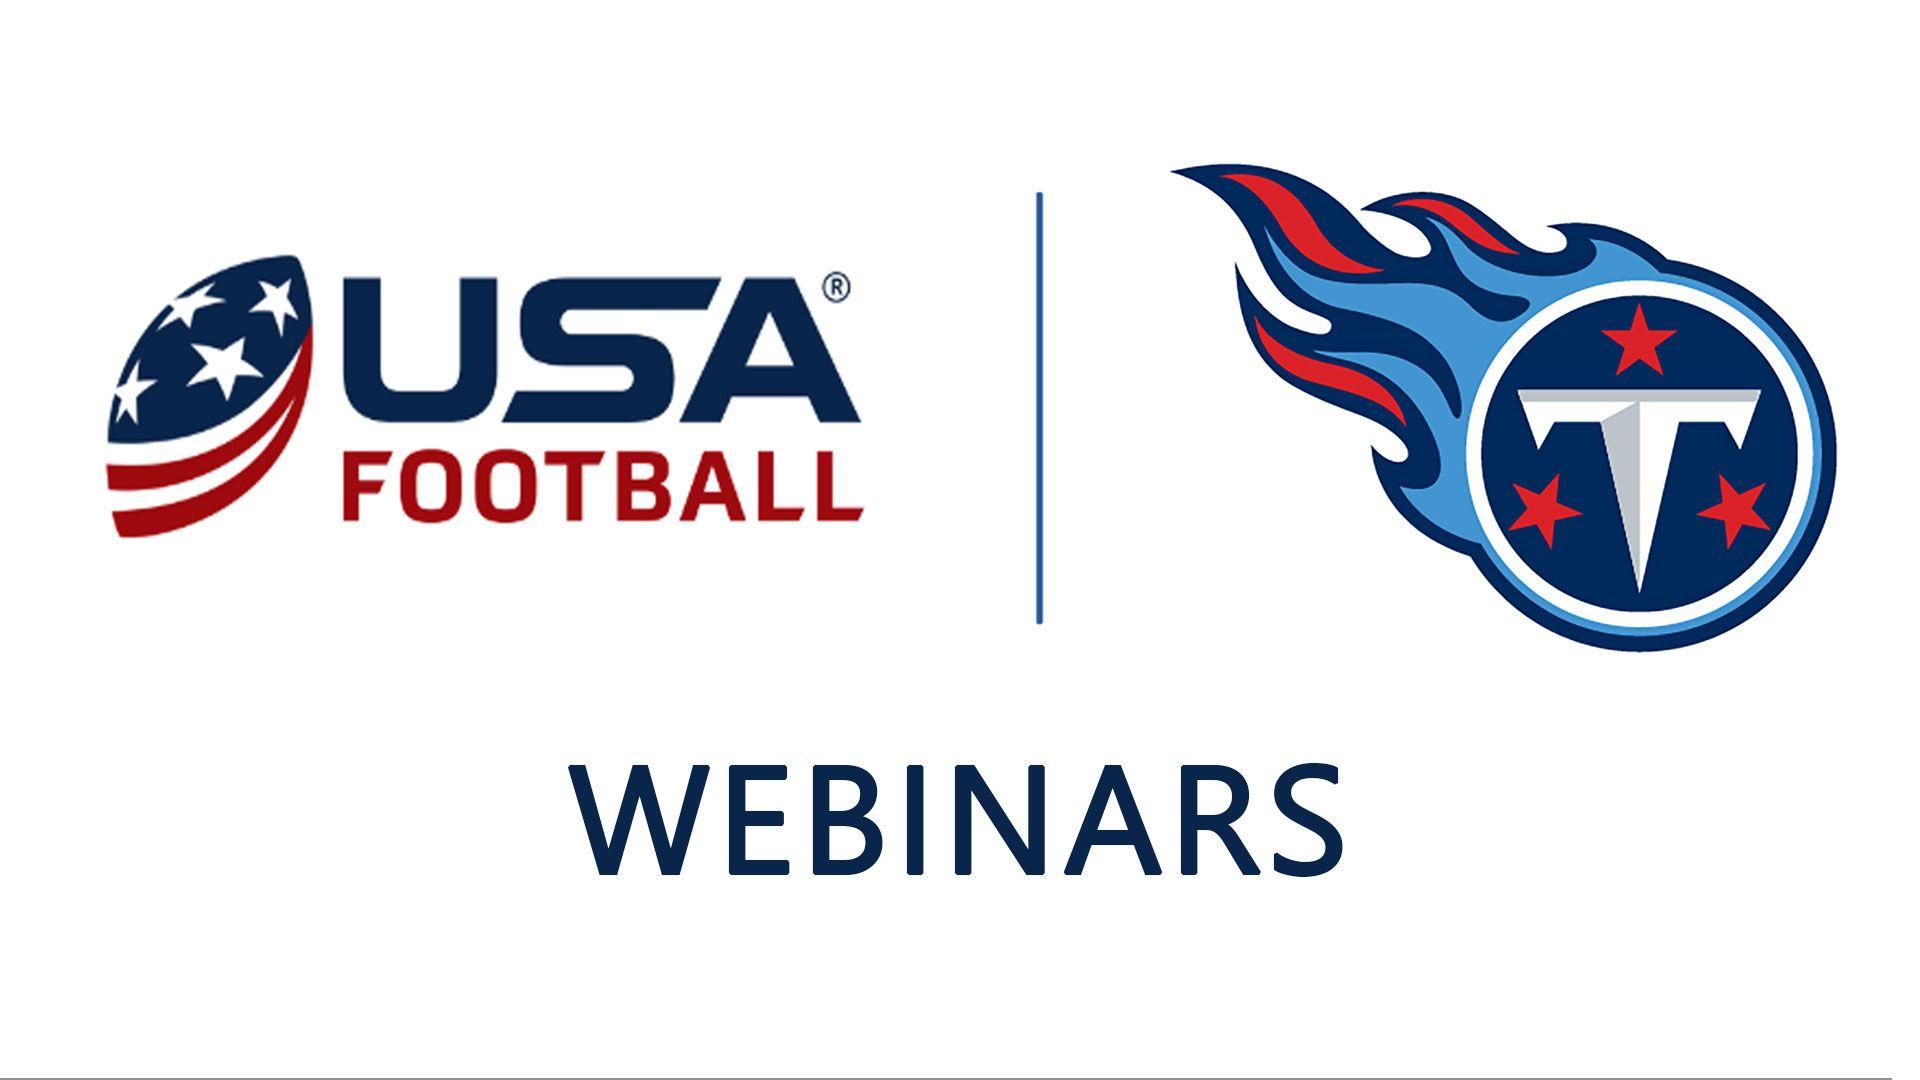 USA Football Webinars